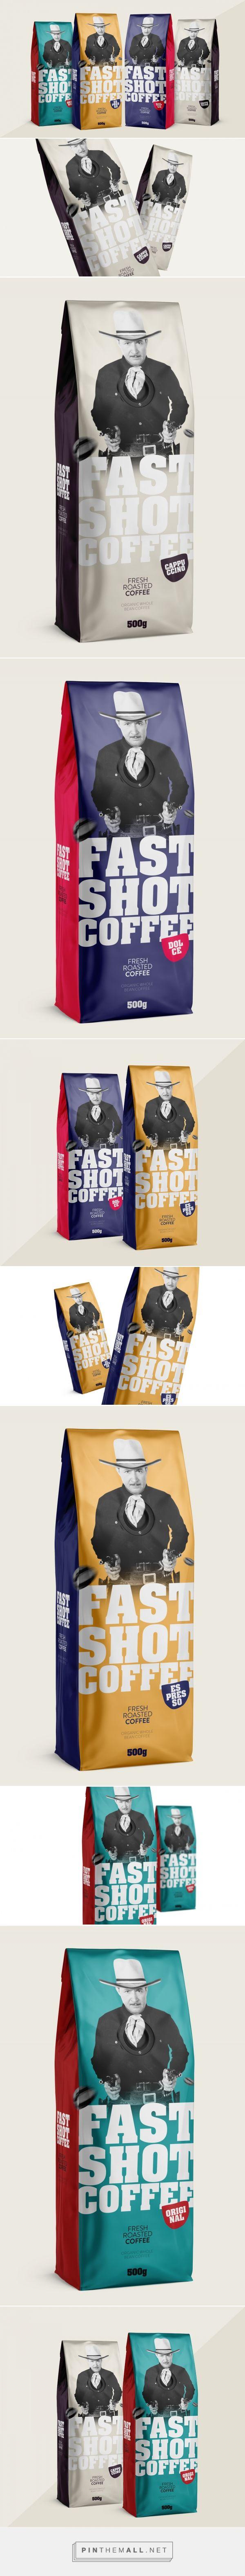 Want a fast shot? Fast Shot Coffee packaging design by ChiapaDesign - http://www.packagingoftheworld.com/2016/12/fast-shot-coffee.html